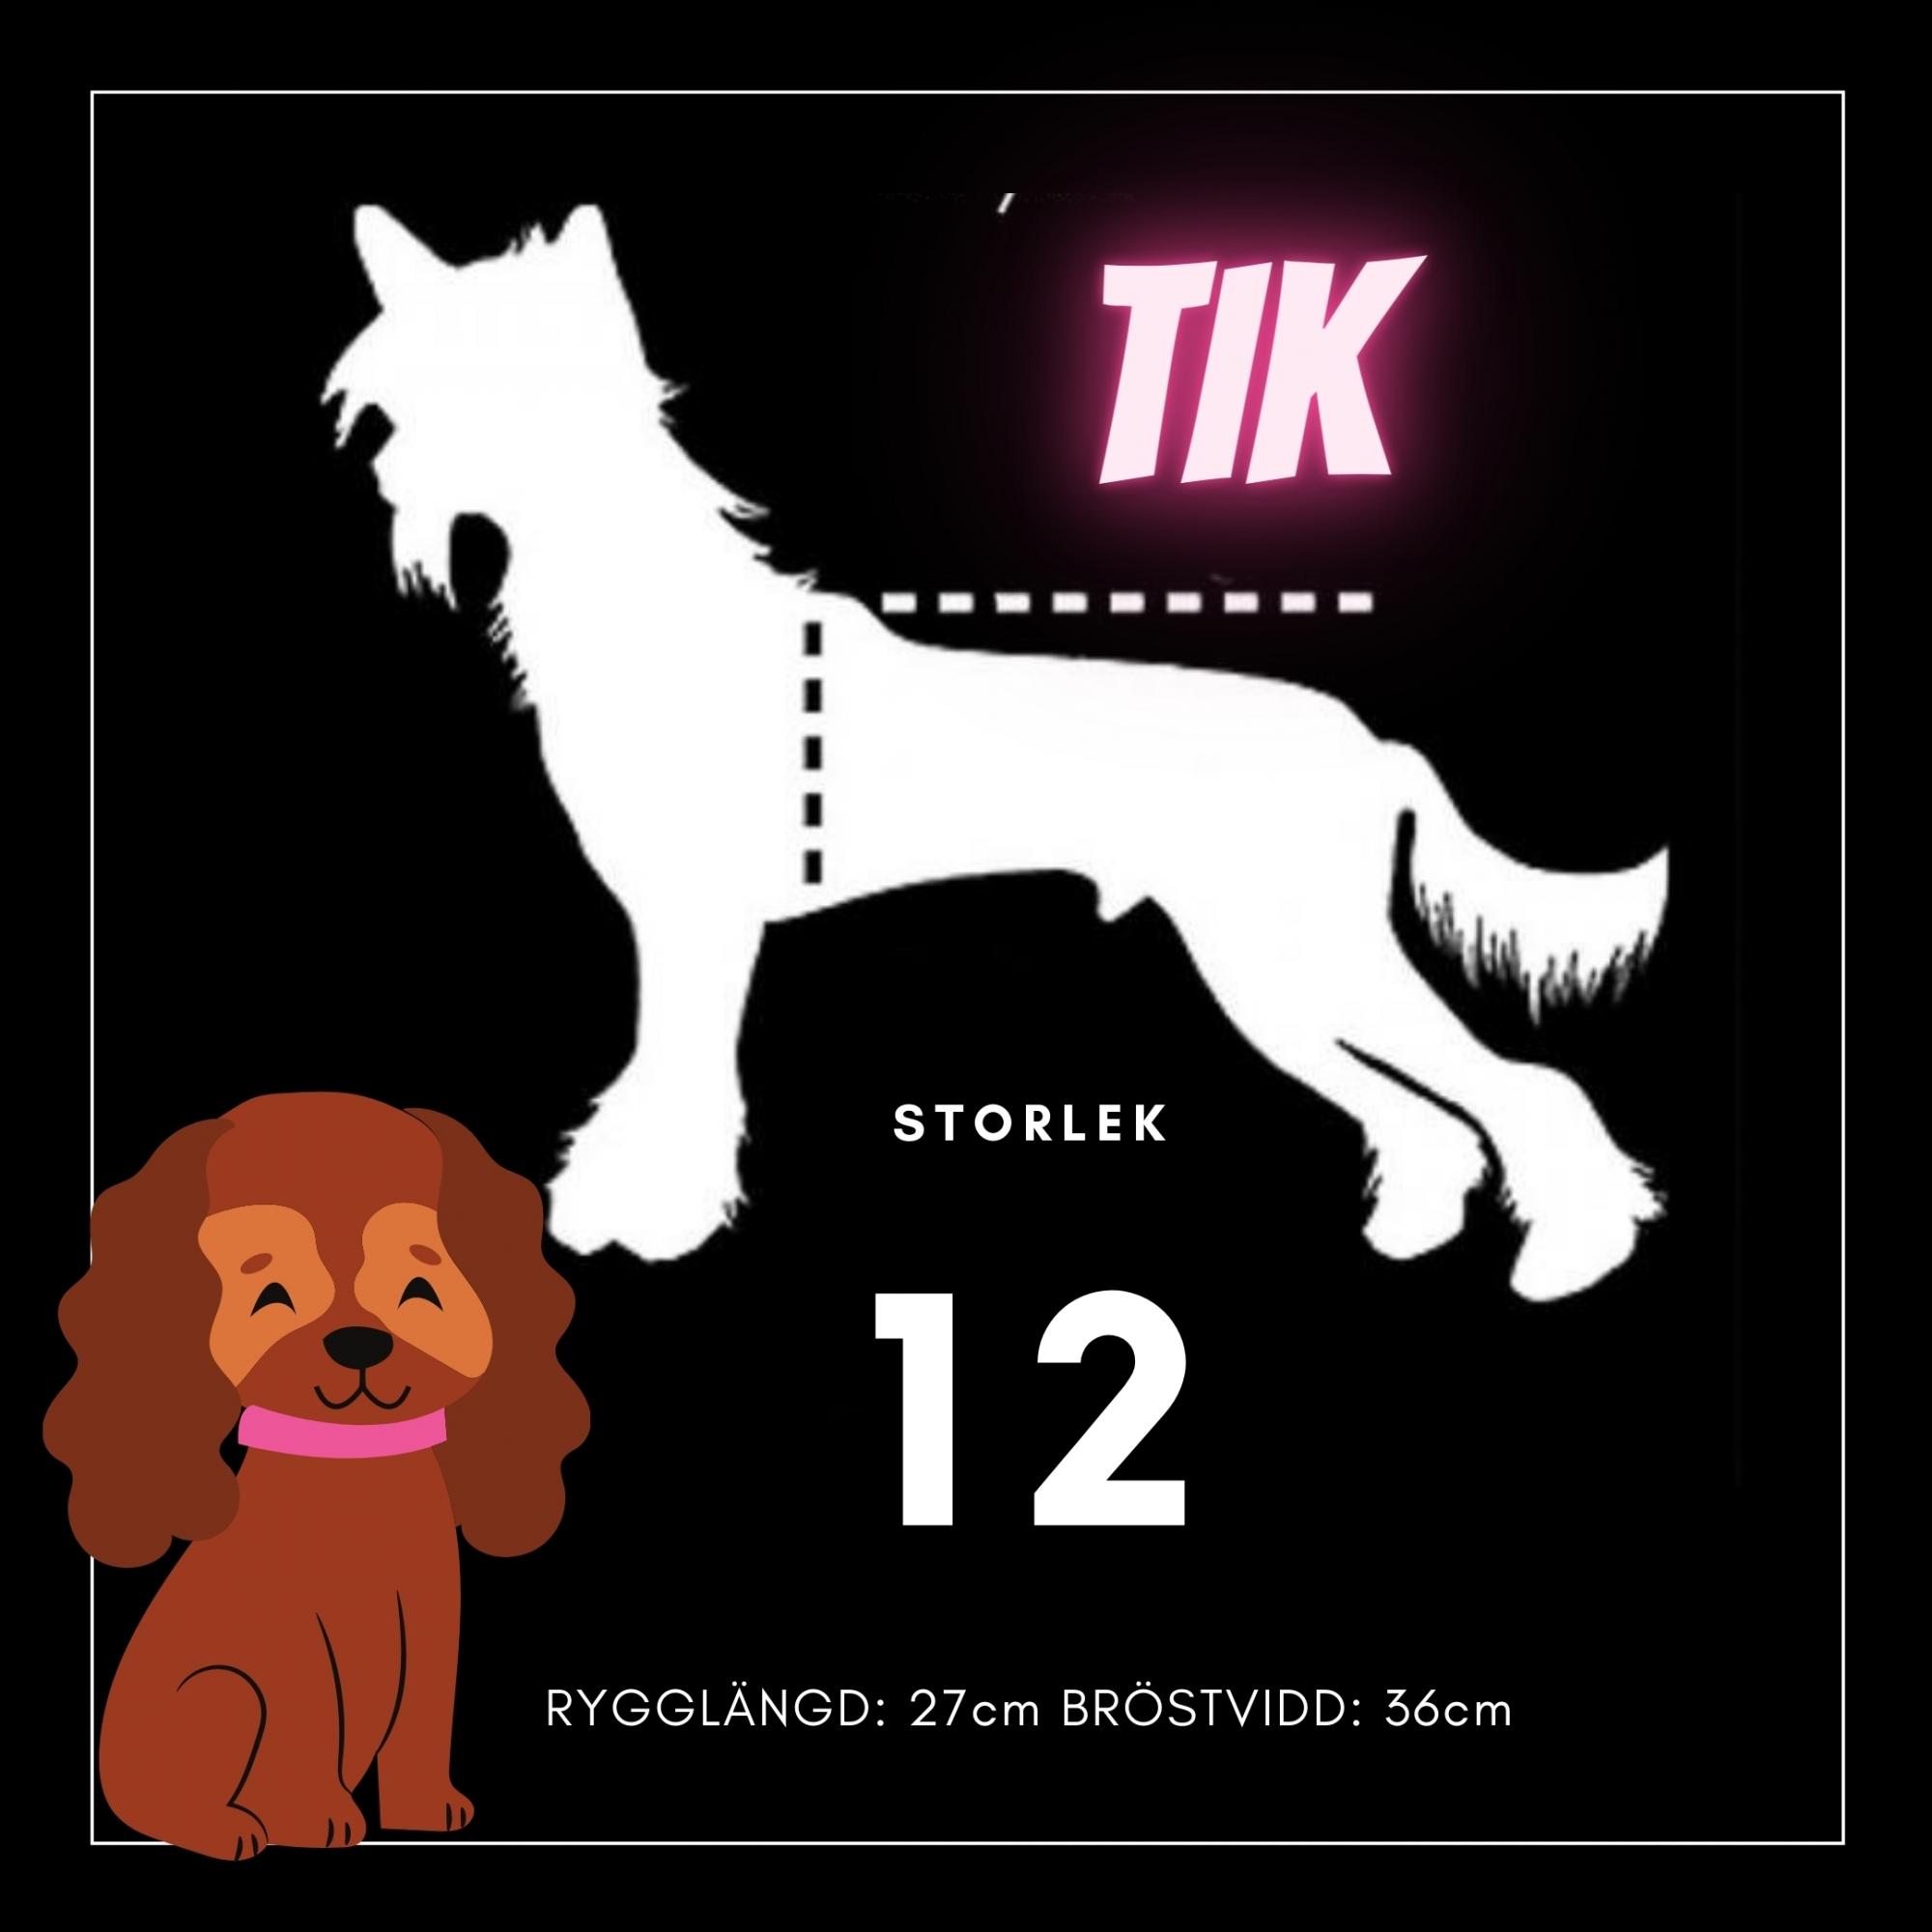 Tik Storlek 12 - Passion For Pet Fashion